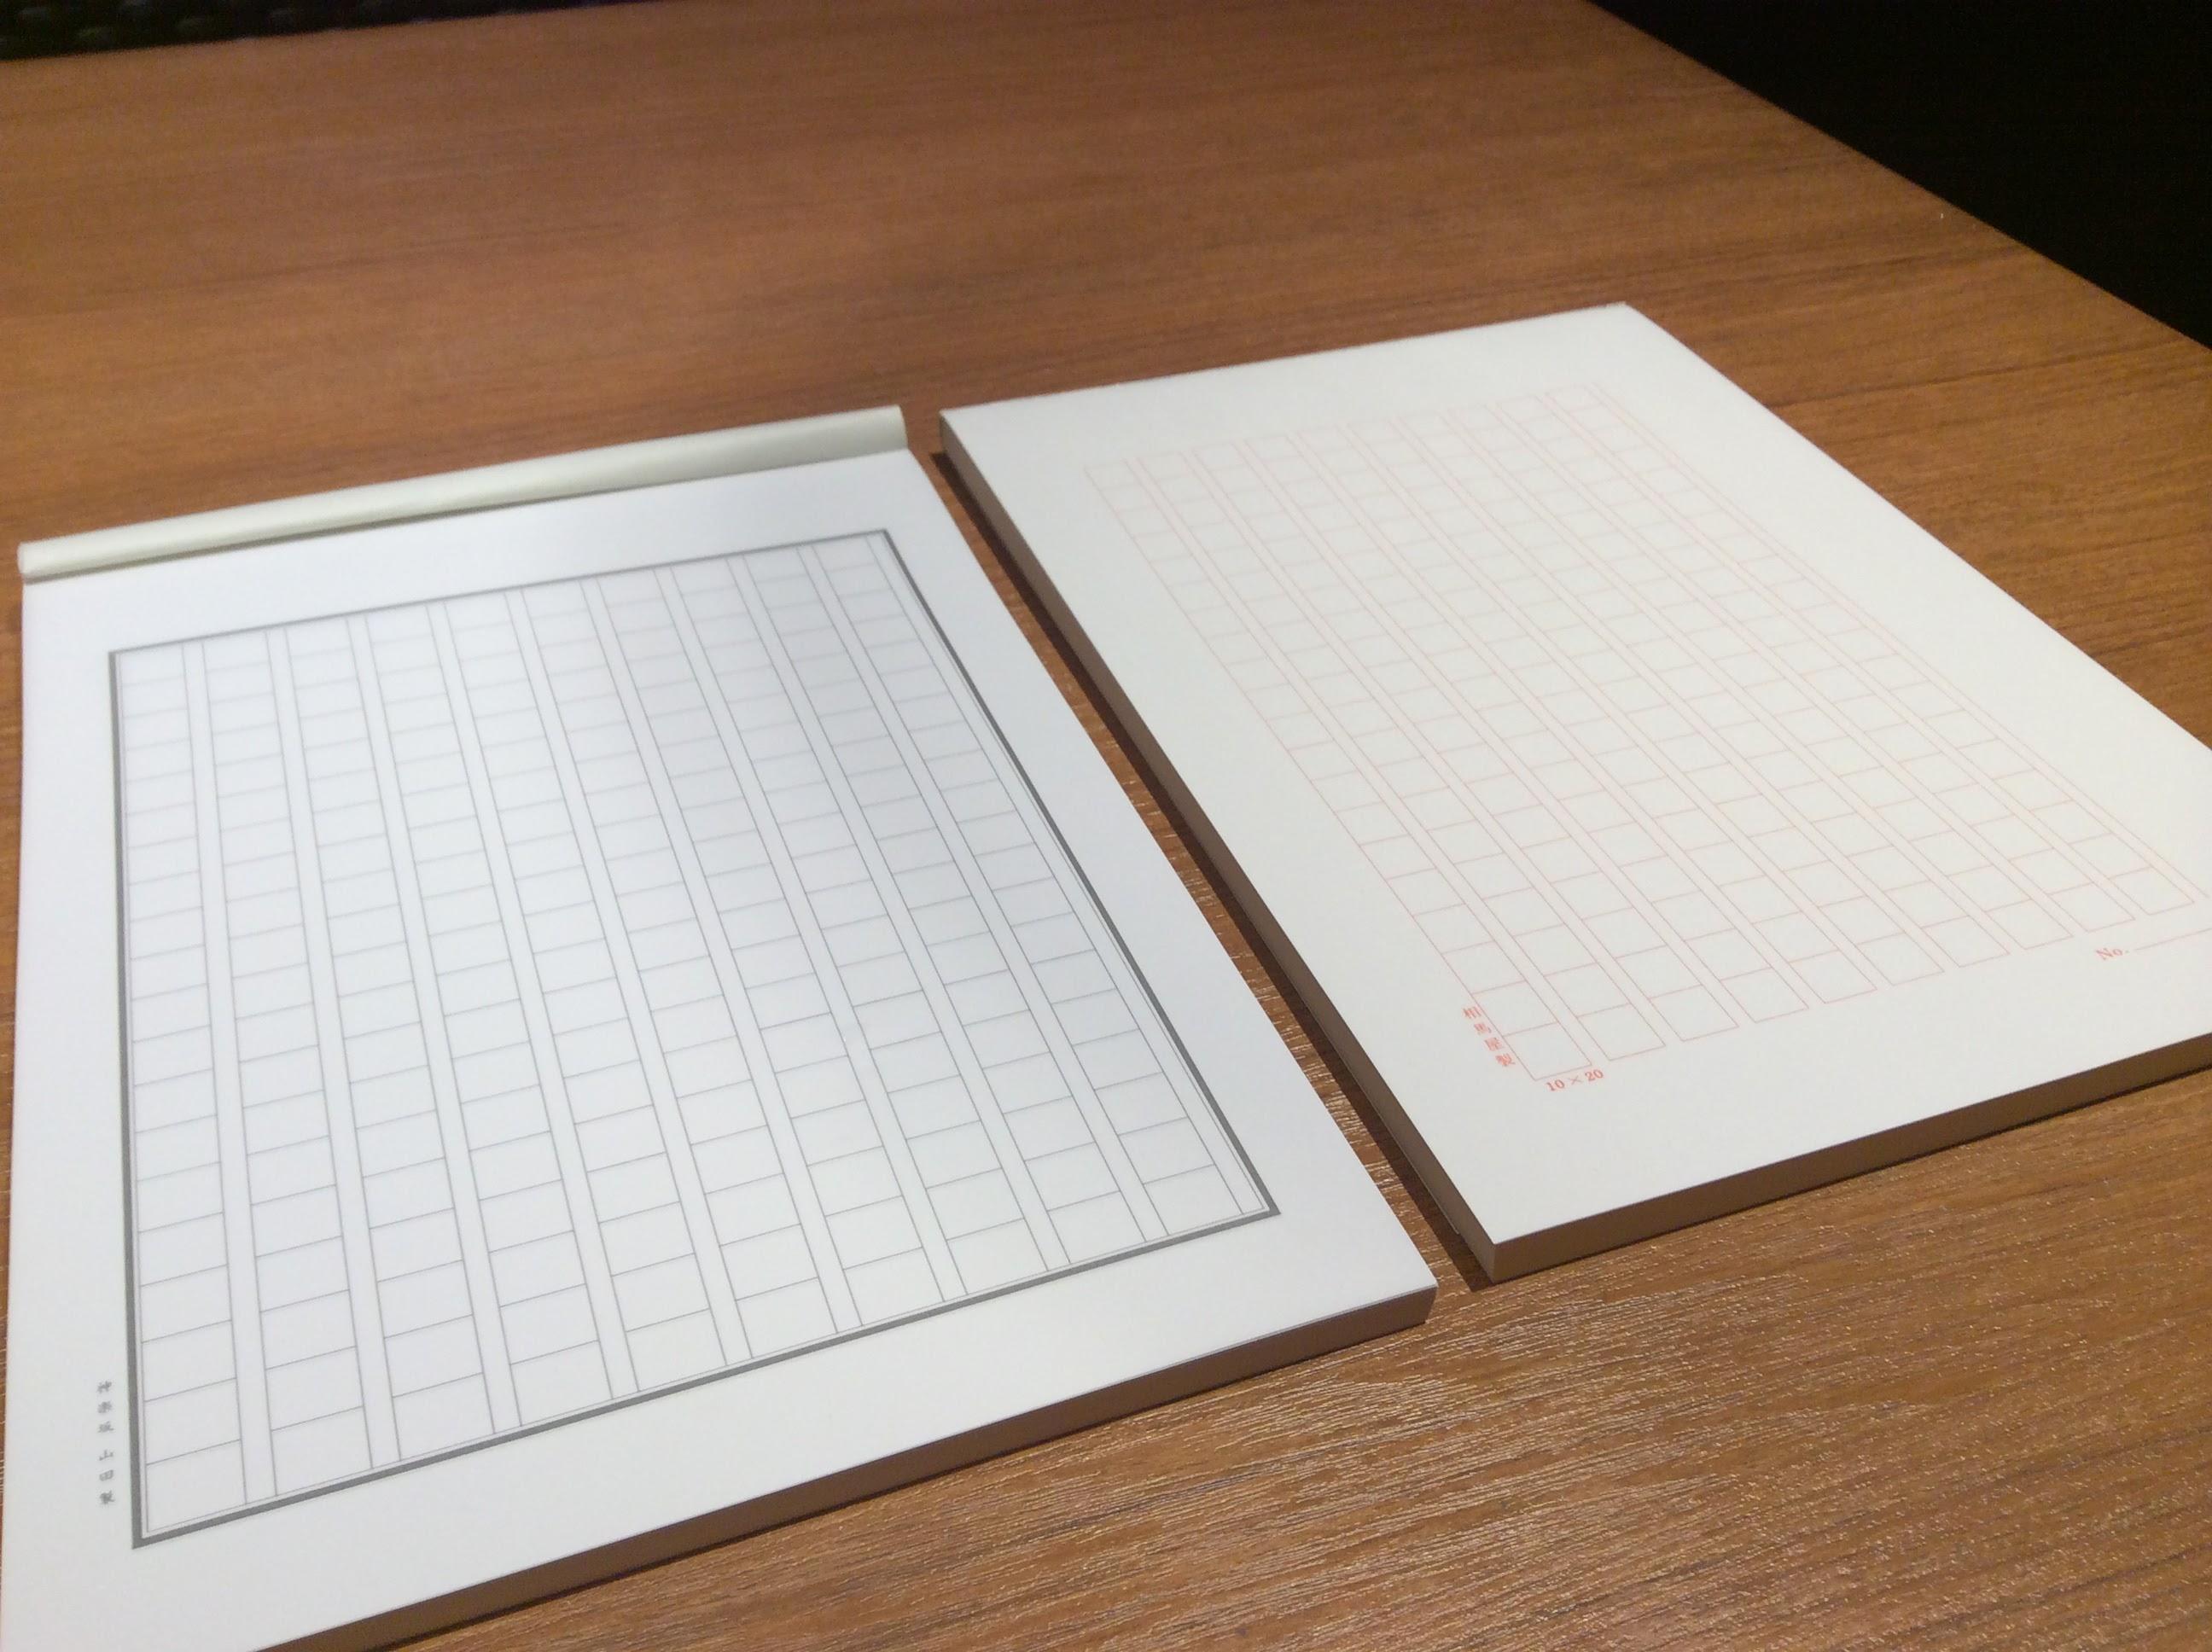 山田紙店と相馬屋の原稿用紙